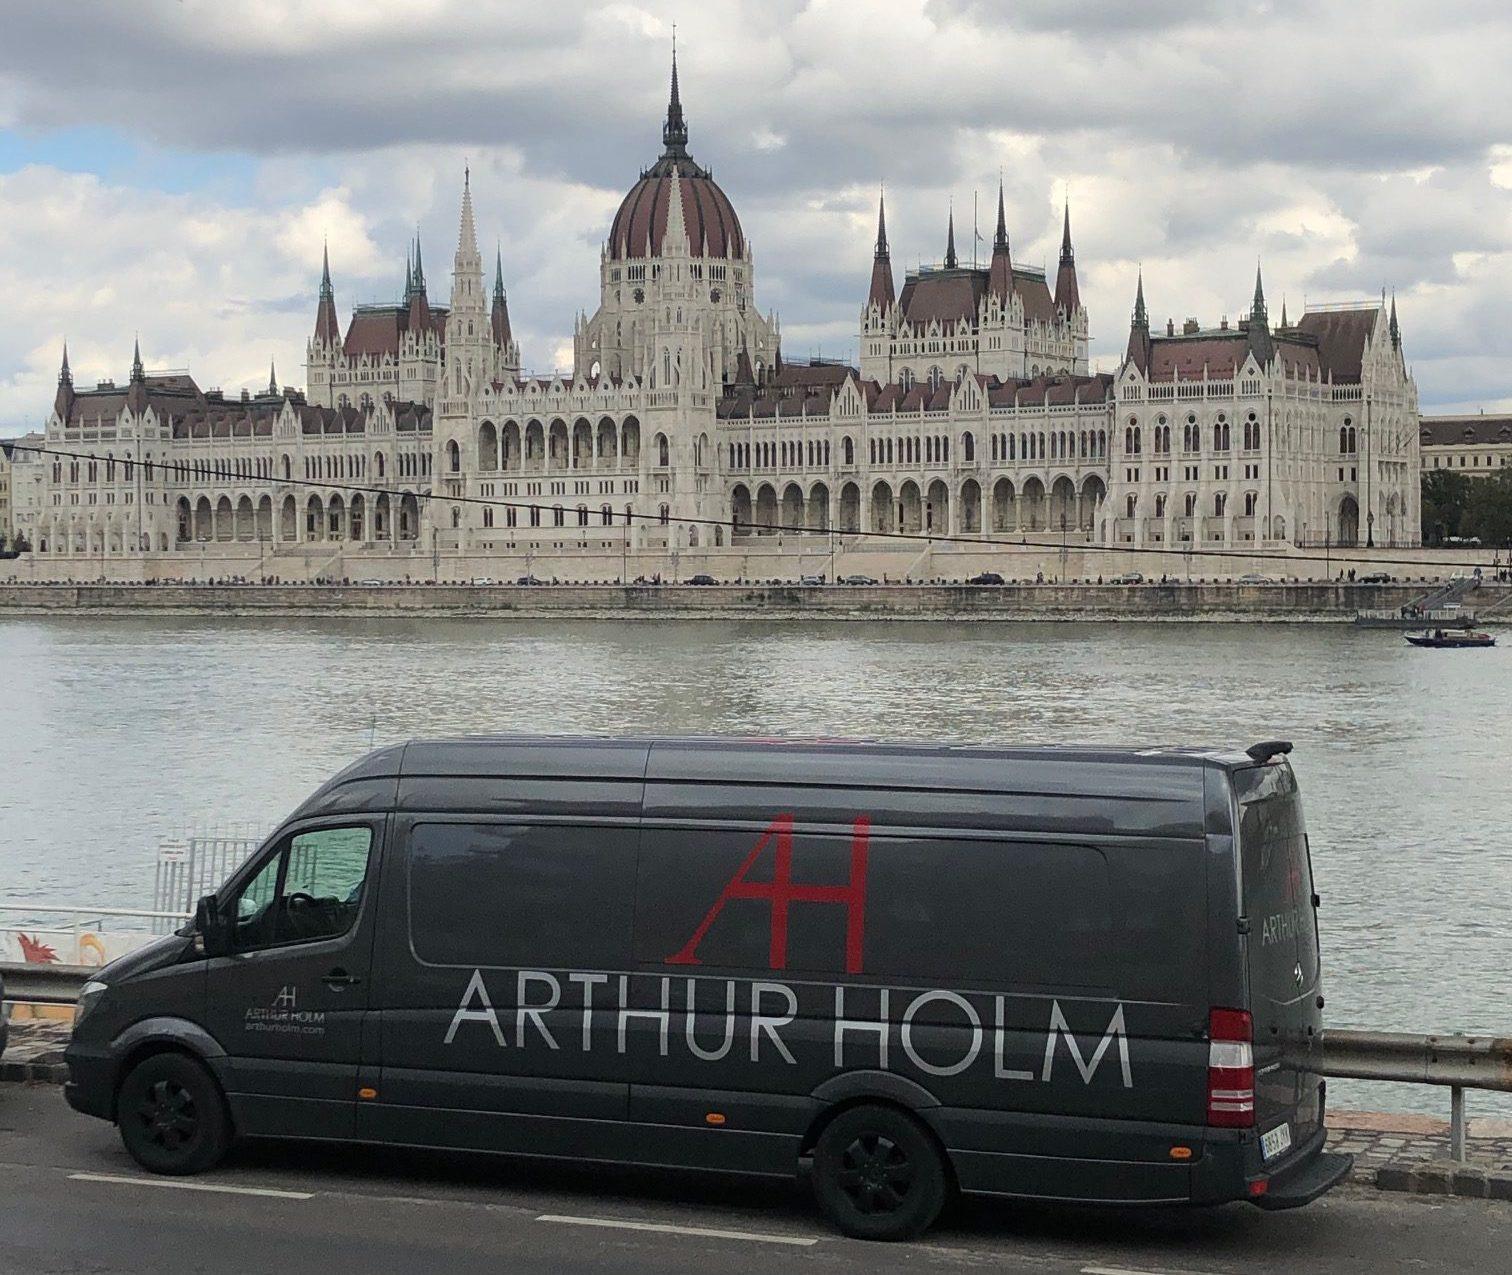 Arthur Holm en la carretera